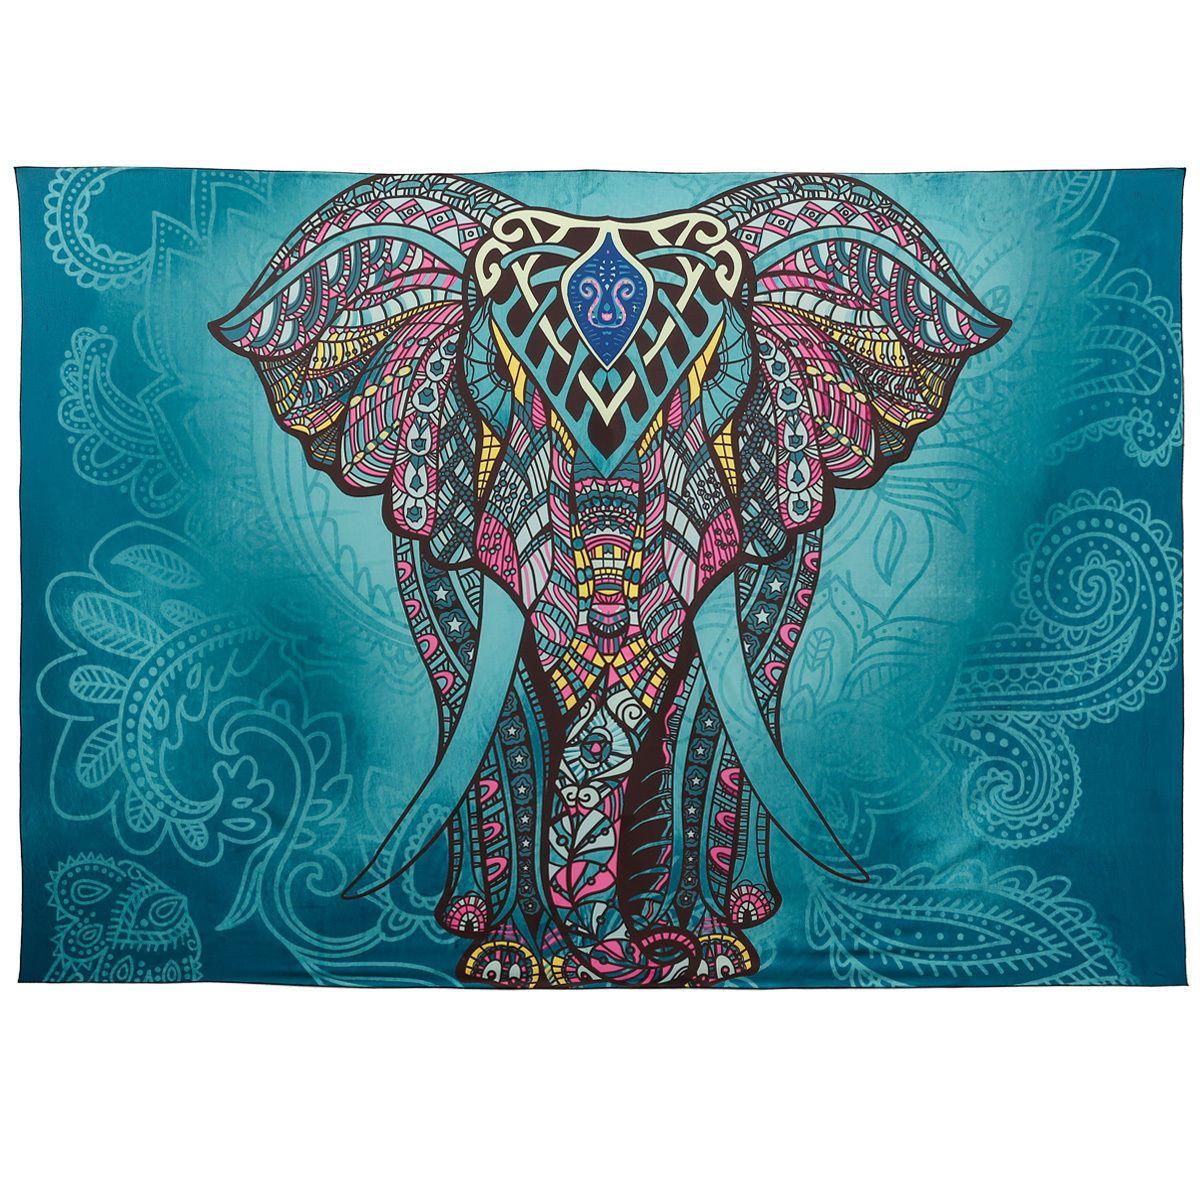 http://www.ebay.de/itm/Indisch-Mandala-Bunt-Elefant-Design ...